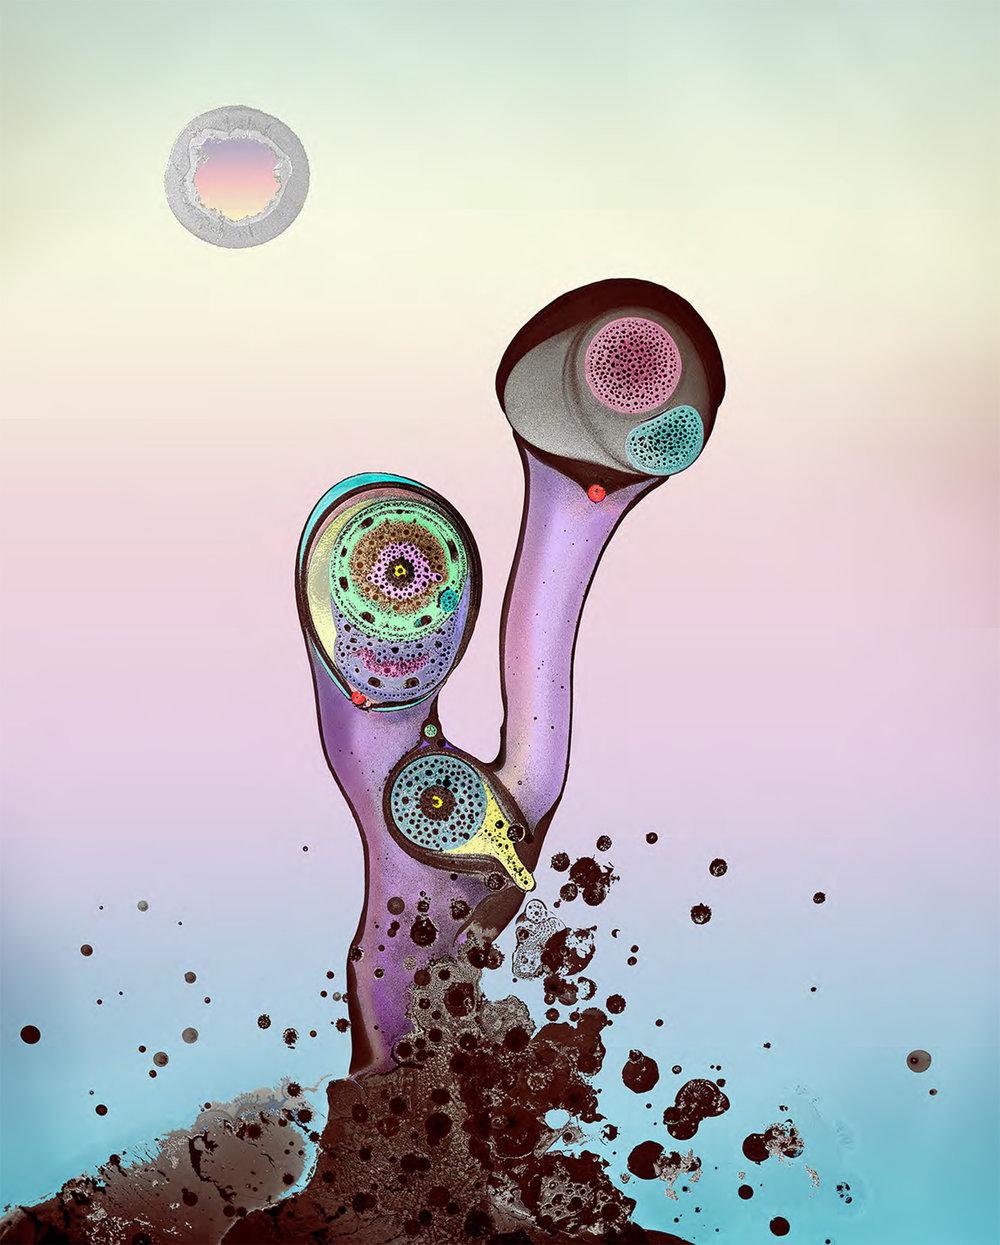 Chemisynthesis_1979.jpg